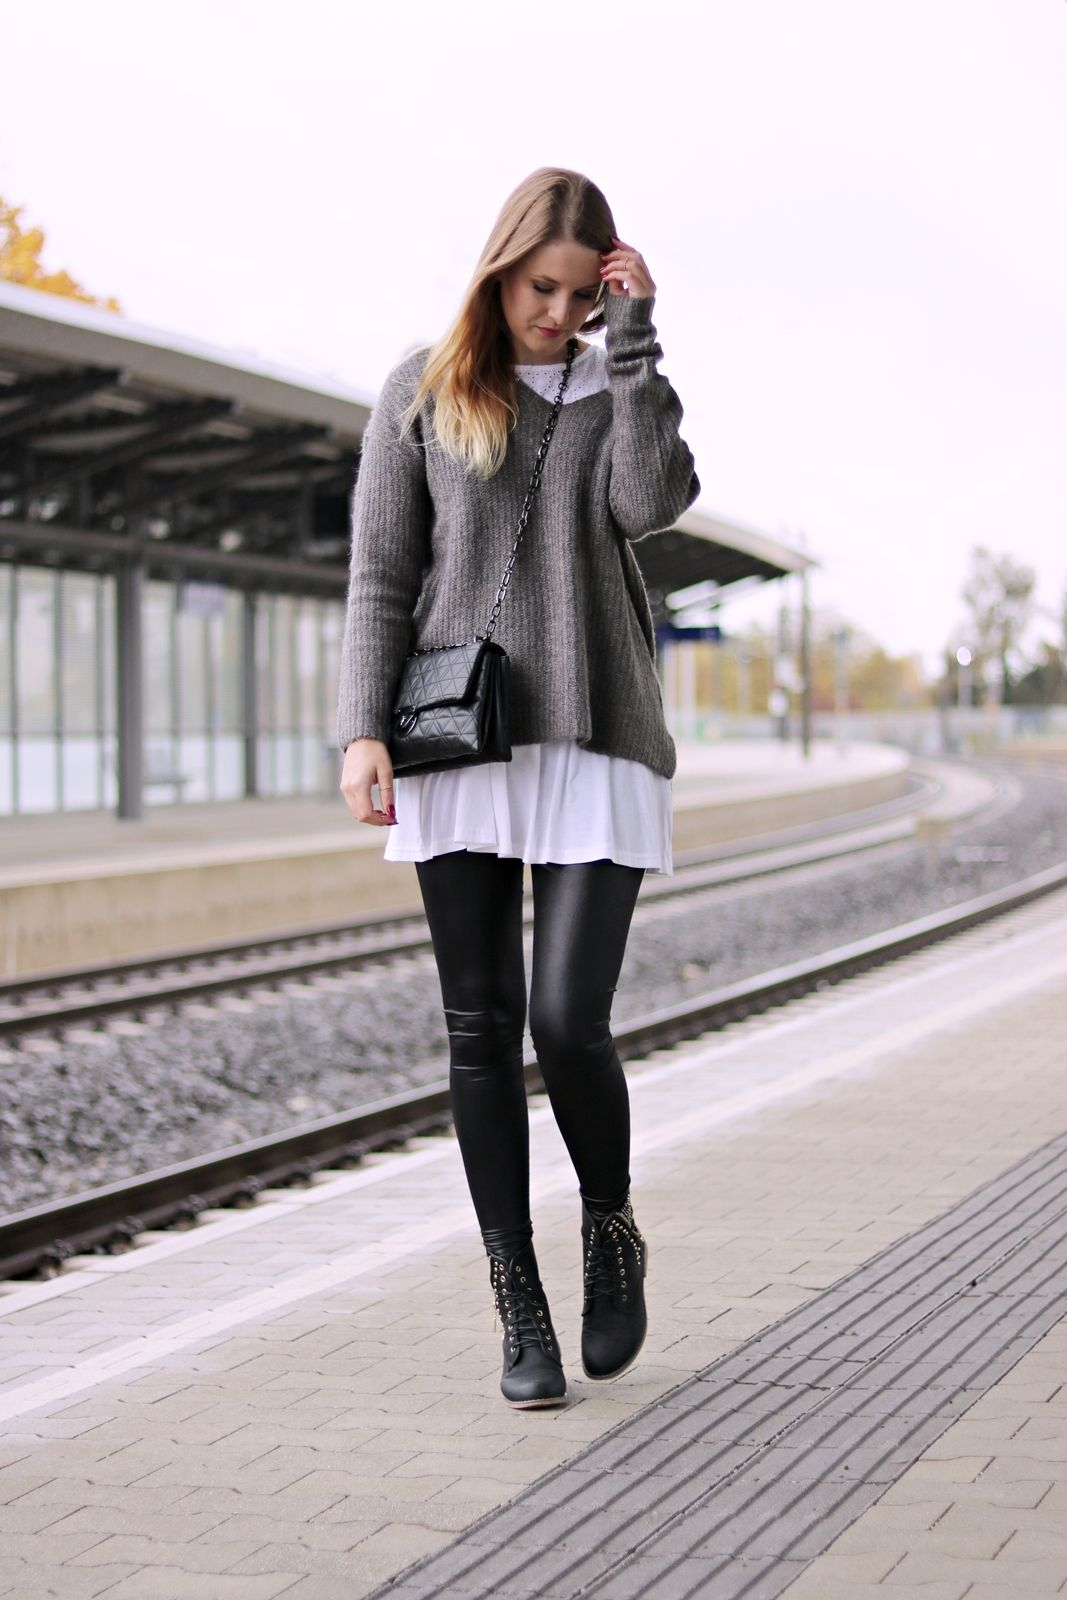 Lederleggings kombinieren - so stylst du diesen Herbst Trend #90sfashiontrends